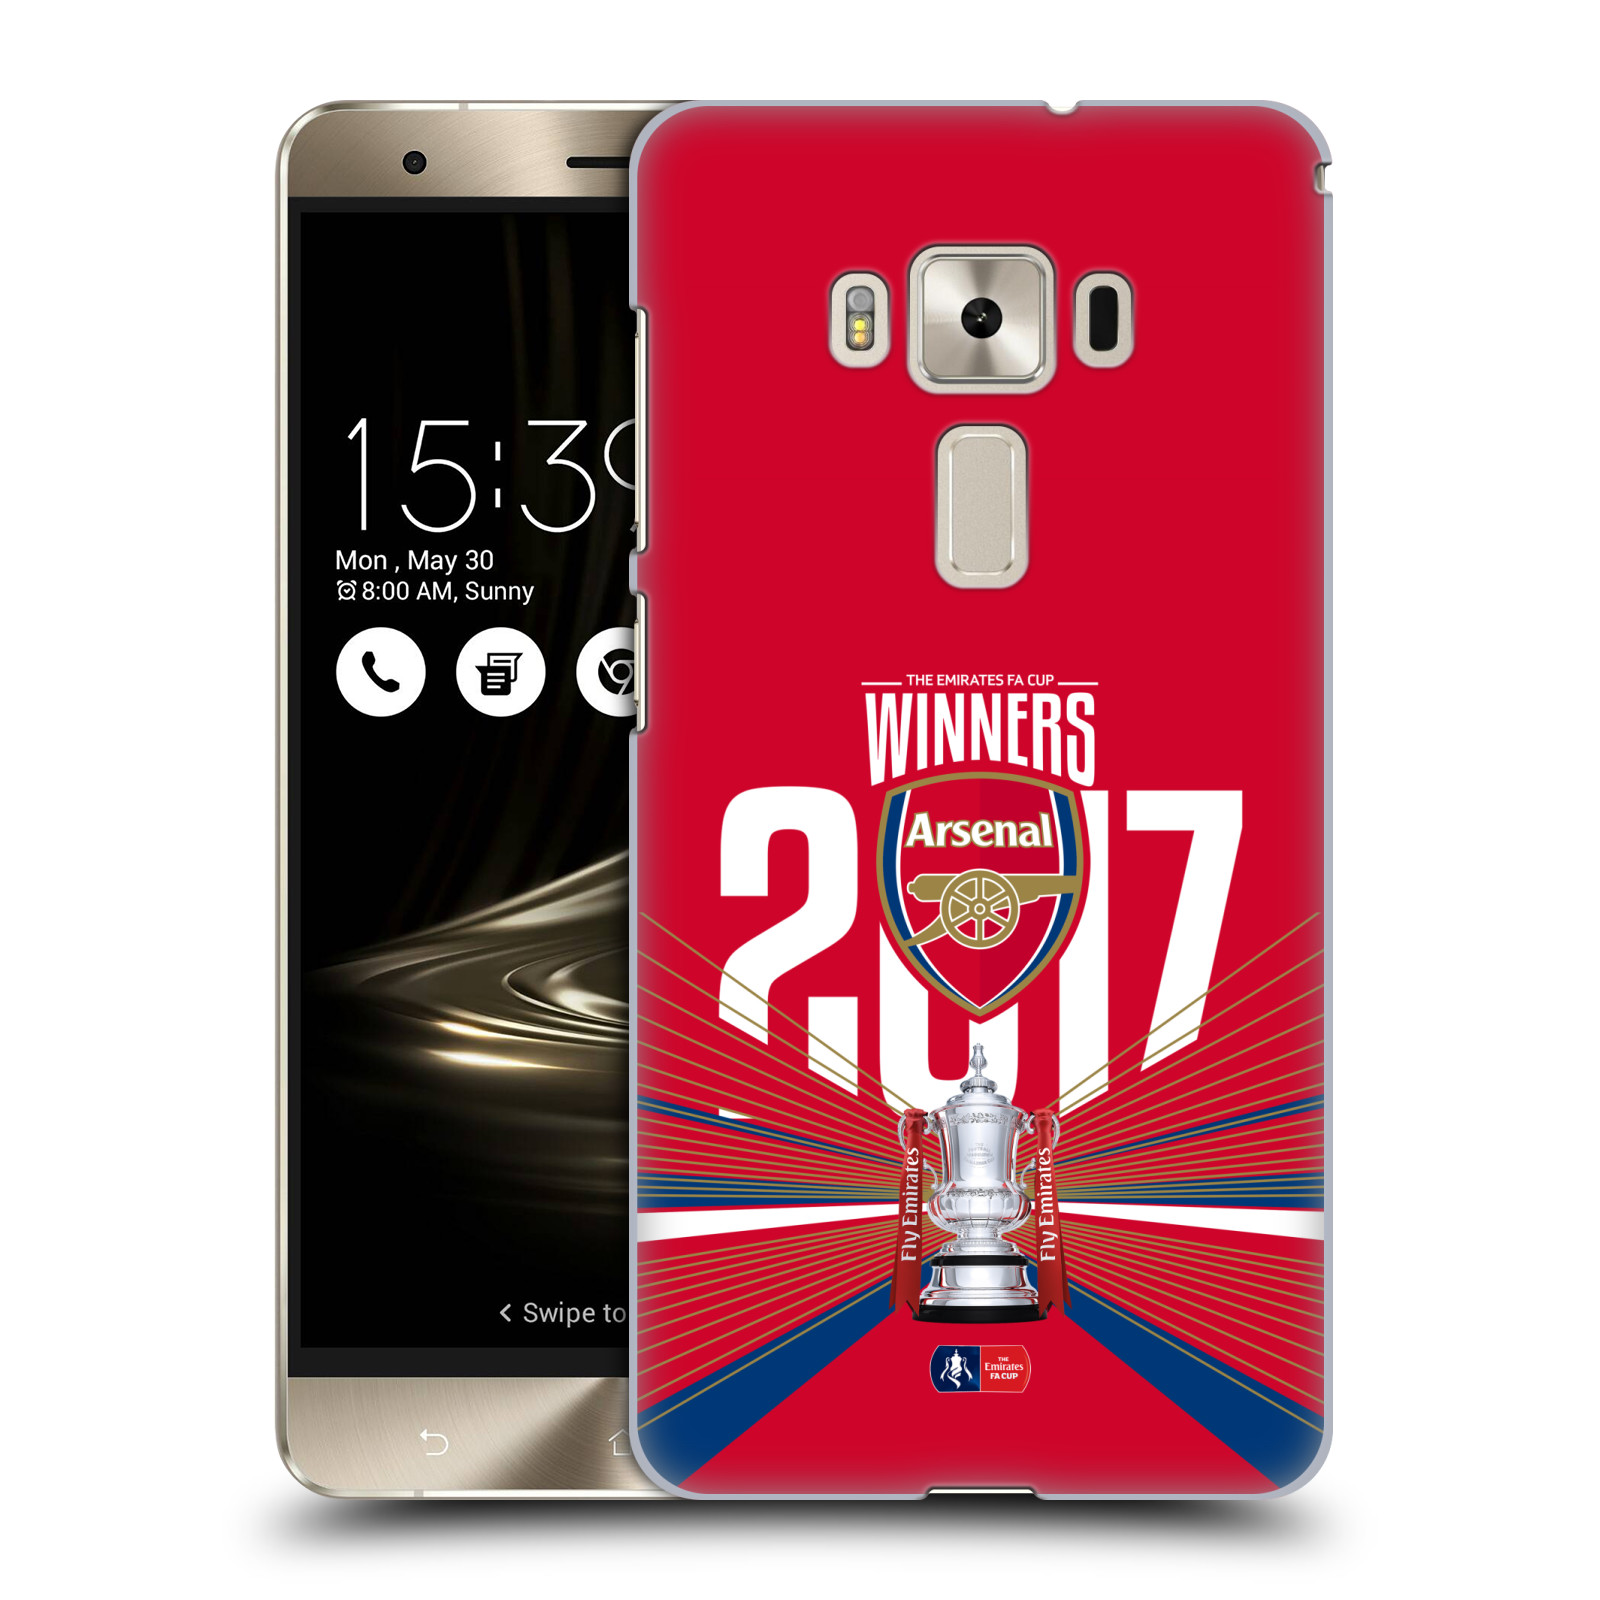 Plastové pouzdro na mobil Asus ZenFone 3 Deluxe ZS570KL - Head Case - Arsenal FC - Trophy